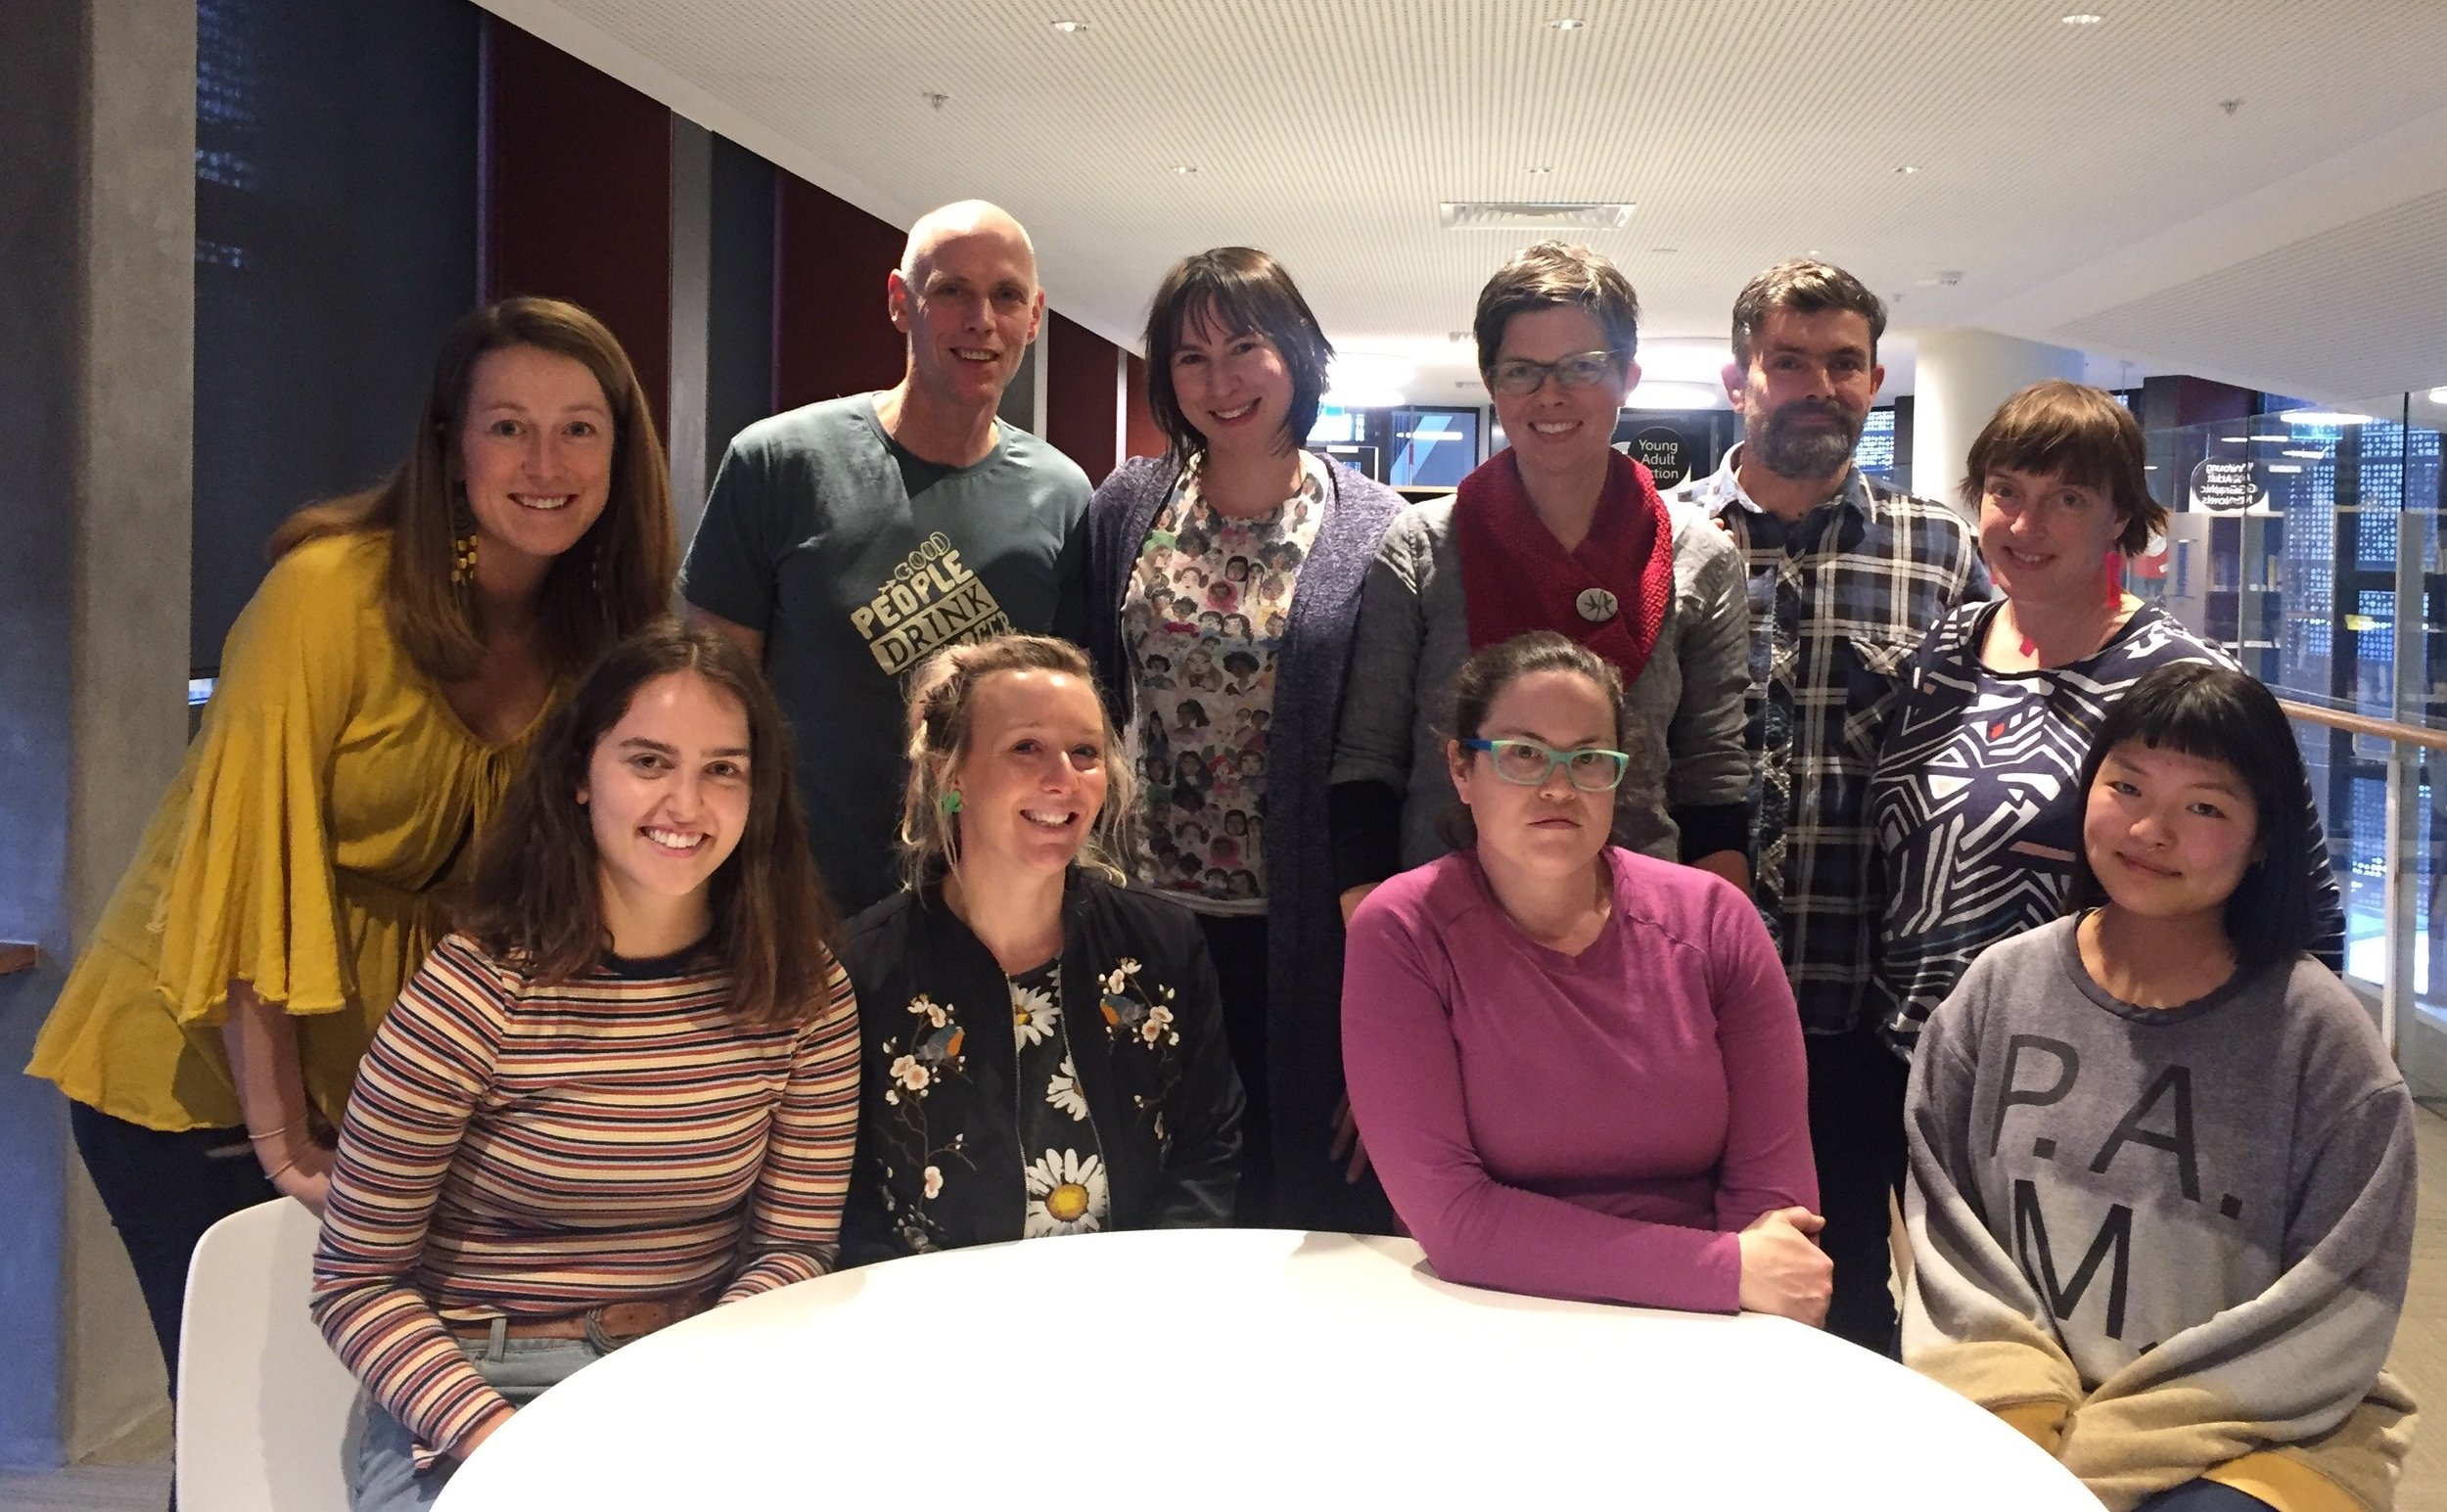 Image: EFFA Community Storytelling Project Participants